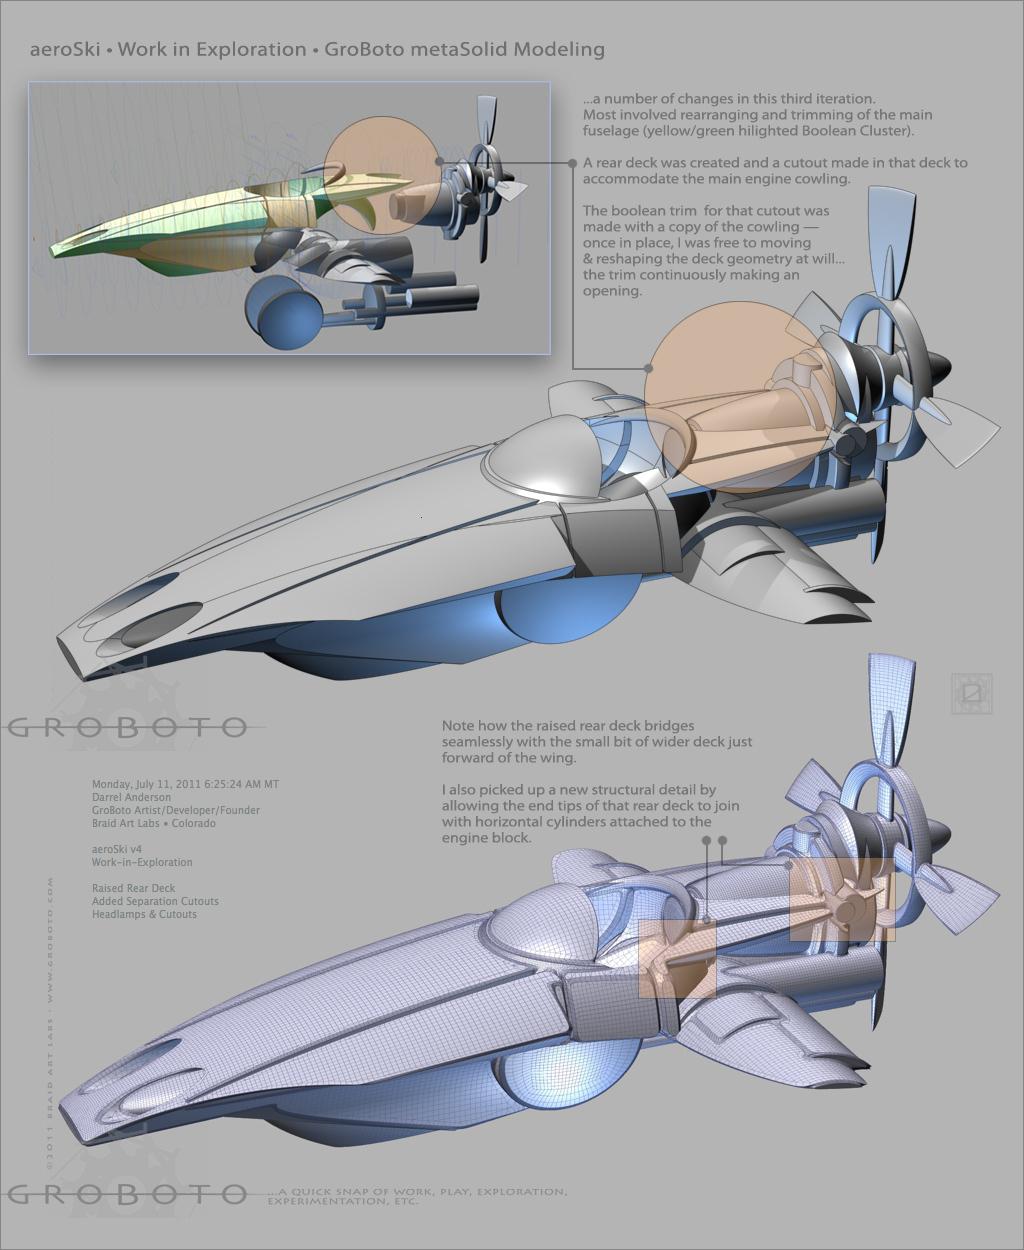 Groboto aeroski groboto meta 1 54161d51 dj40